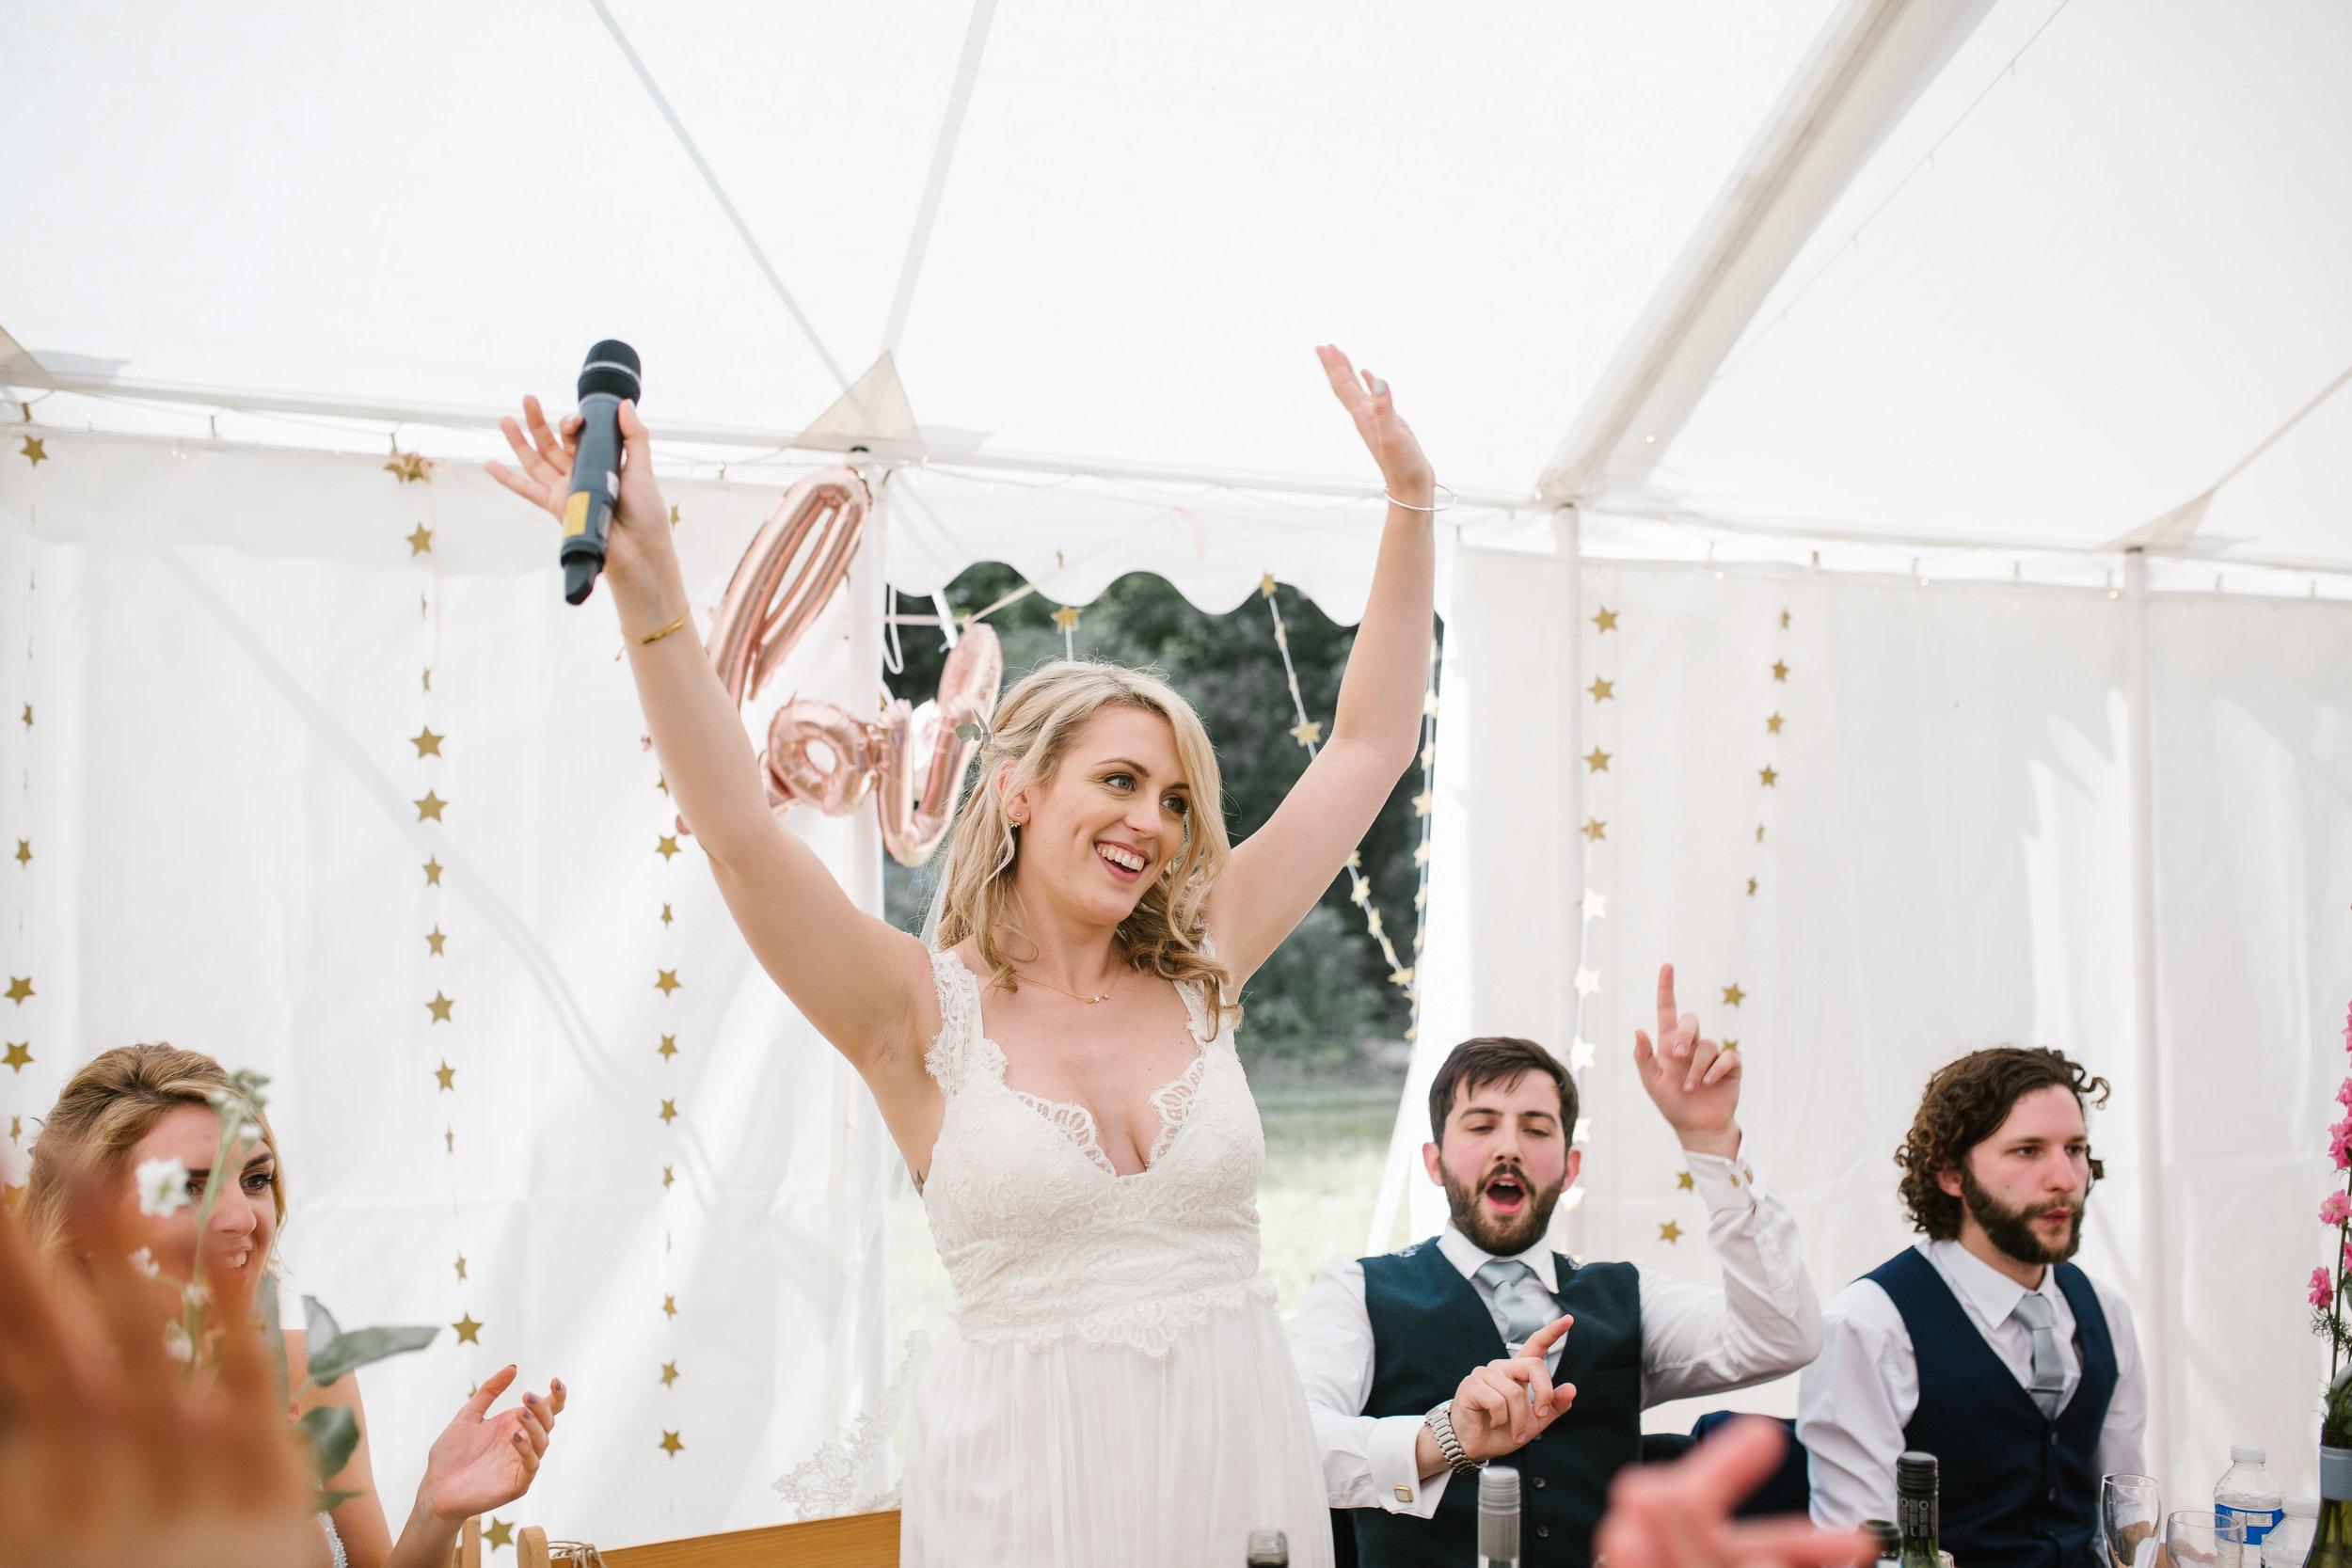 Cotswolds wedding, cotswolds wedding photographer, DIY wedding, forest wedding, marquee wedding, fun wedding, alternative wedding-346.jpg